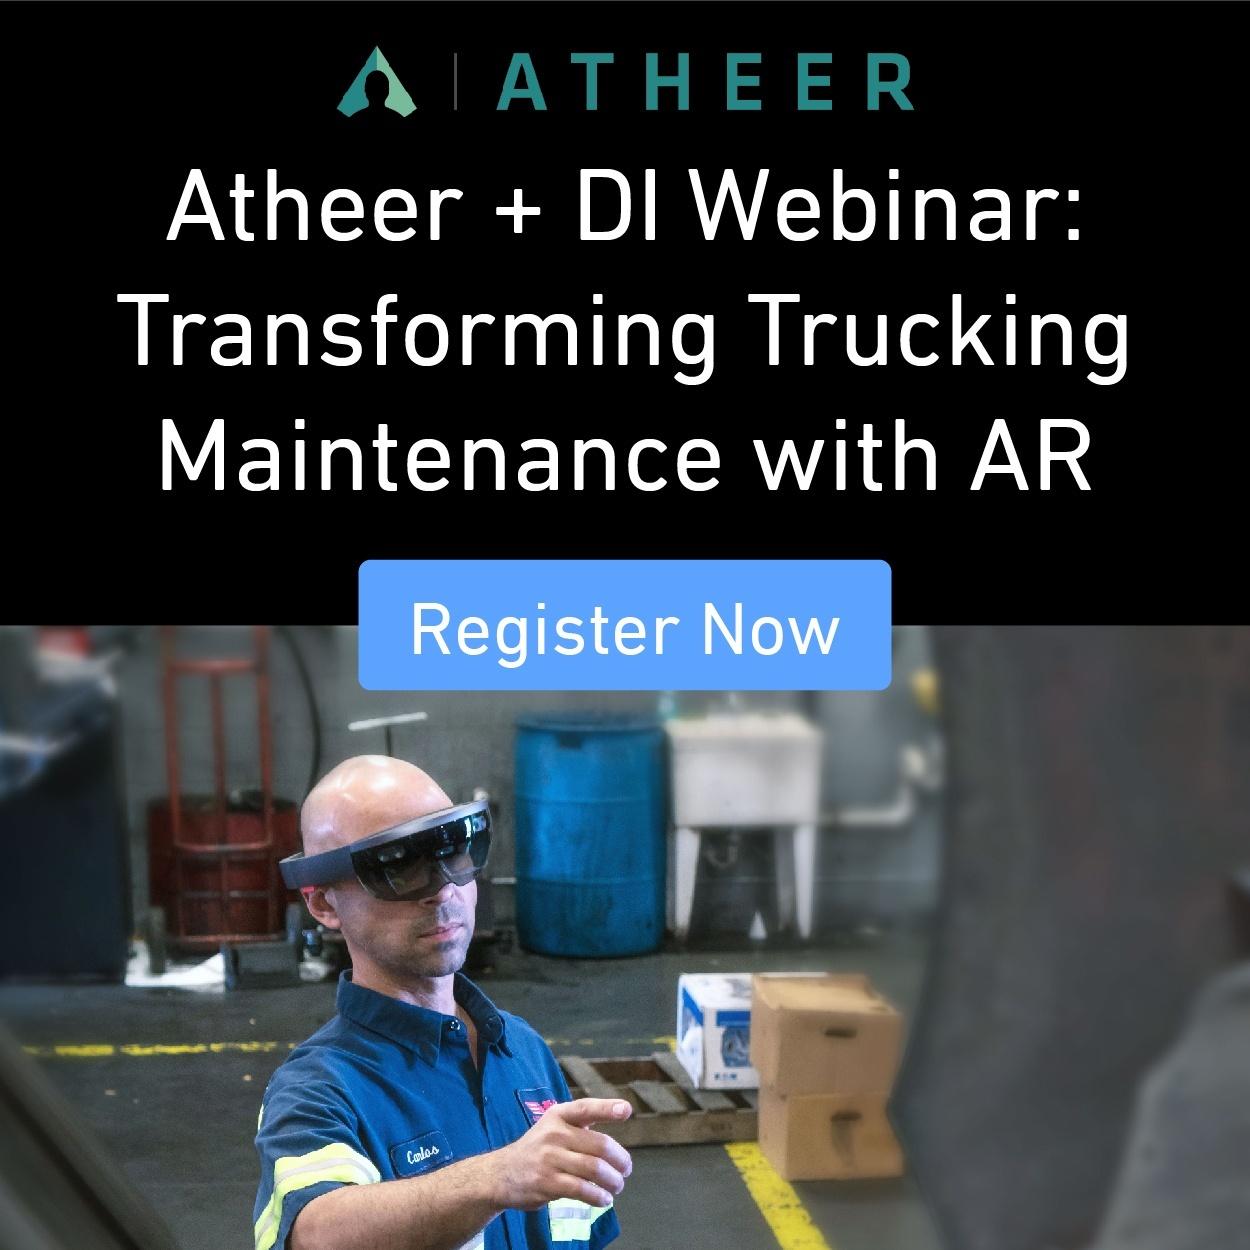 Register Now - Atheer + Design Interactive Webinar: Transforming Trucking Maintenance with AR